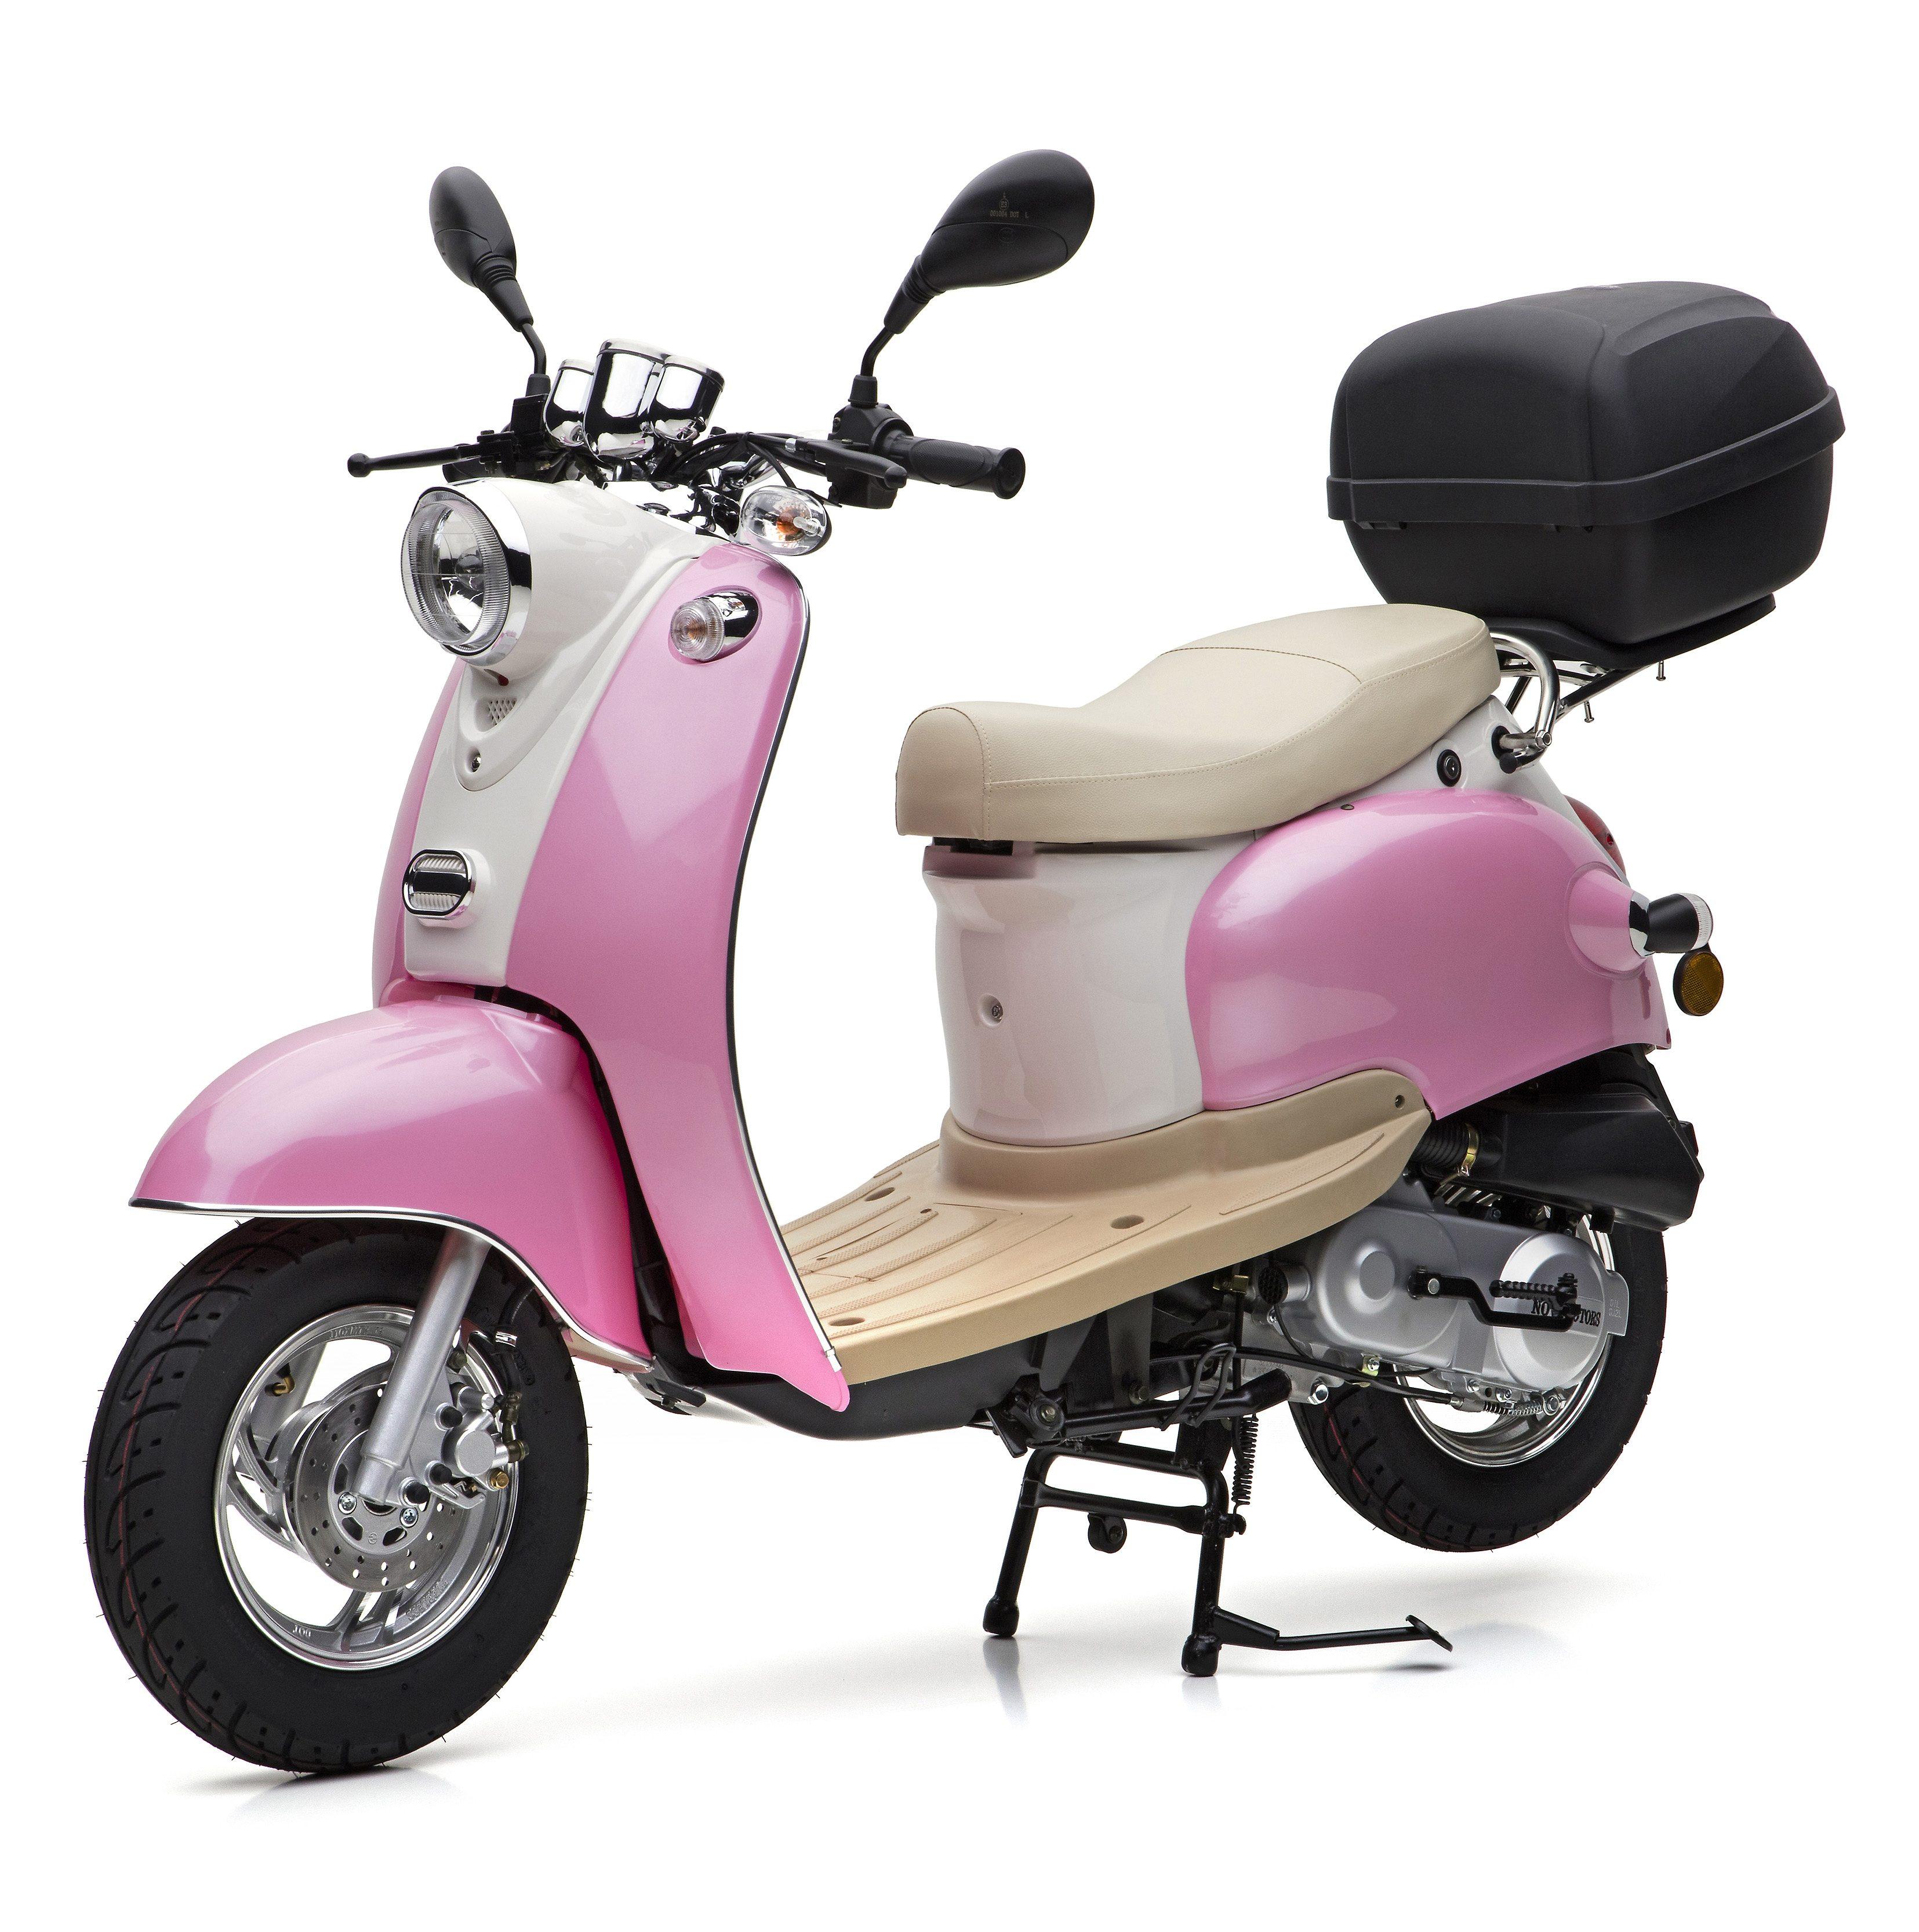 Nova Motors Motorroller inkl. Topcase, 49 ccm, 45 km/h, rosa weiß, »Venezia II«